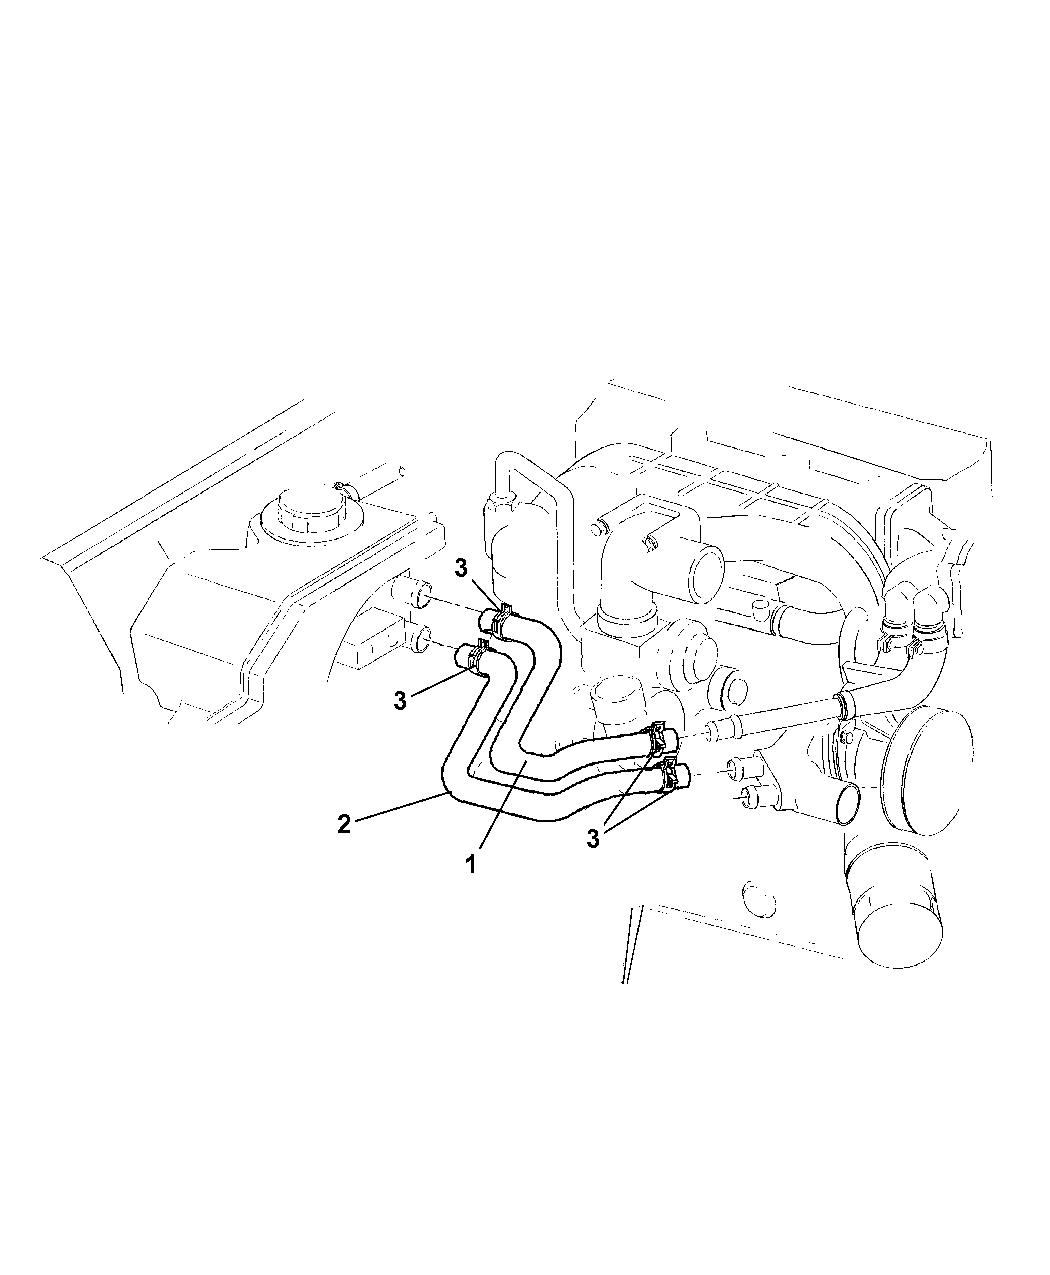 55037301